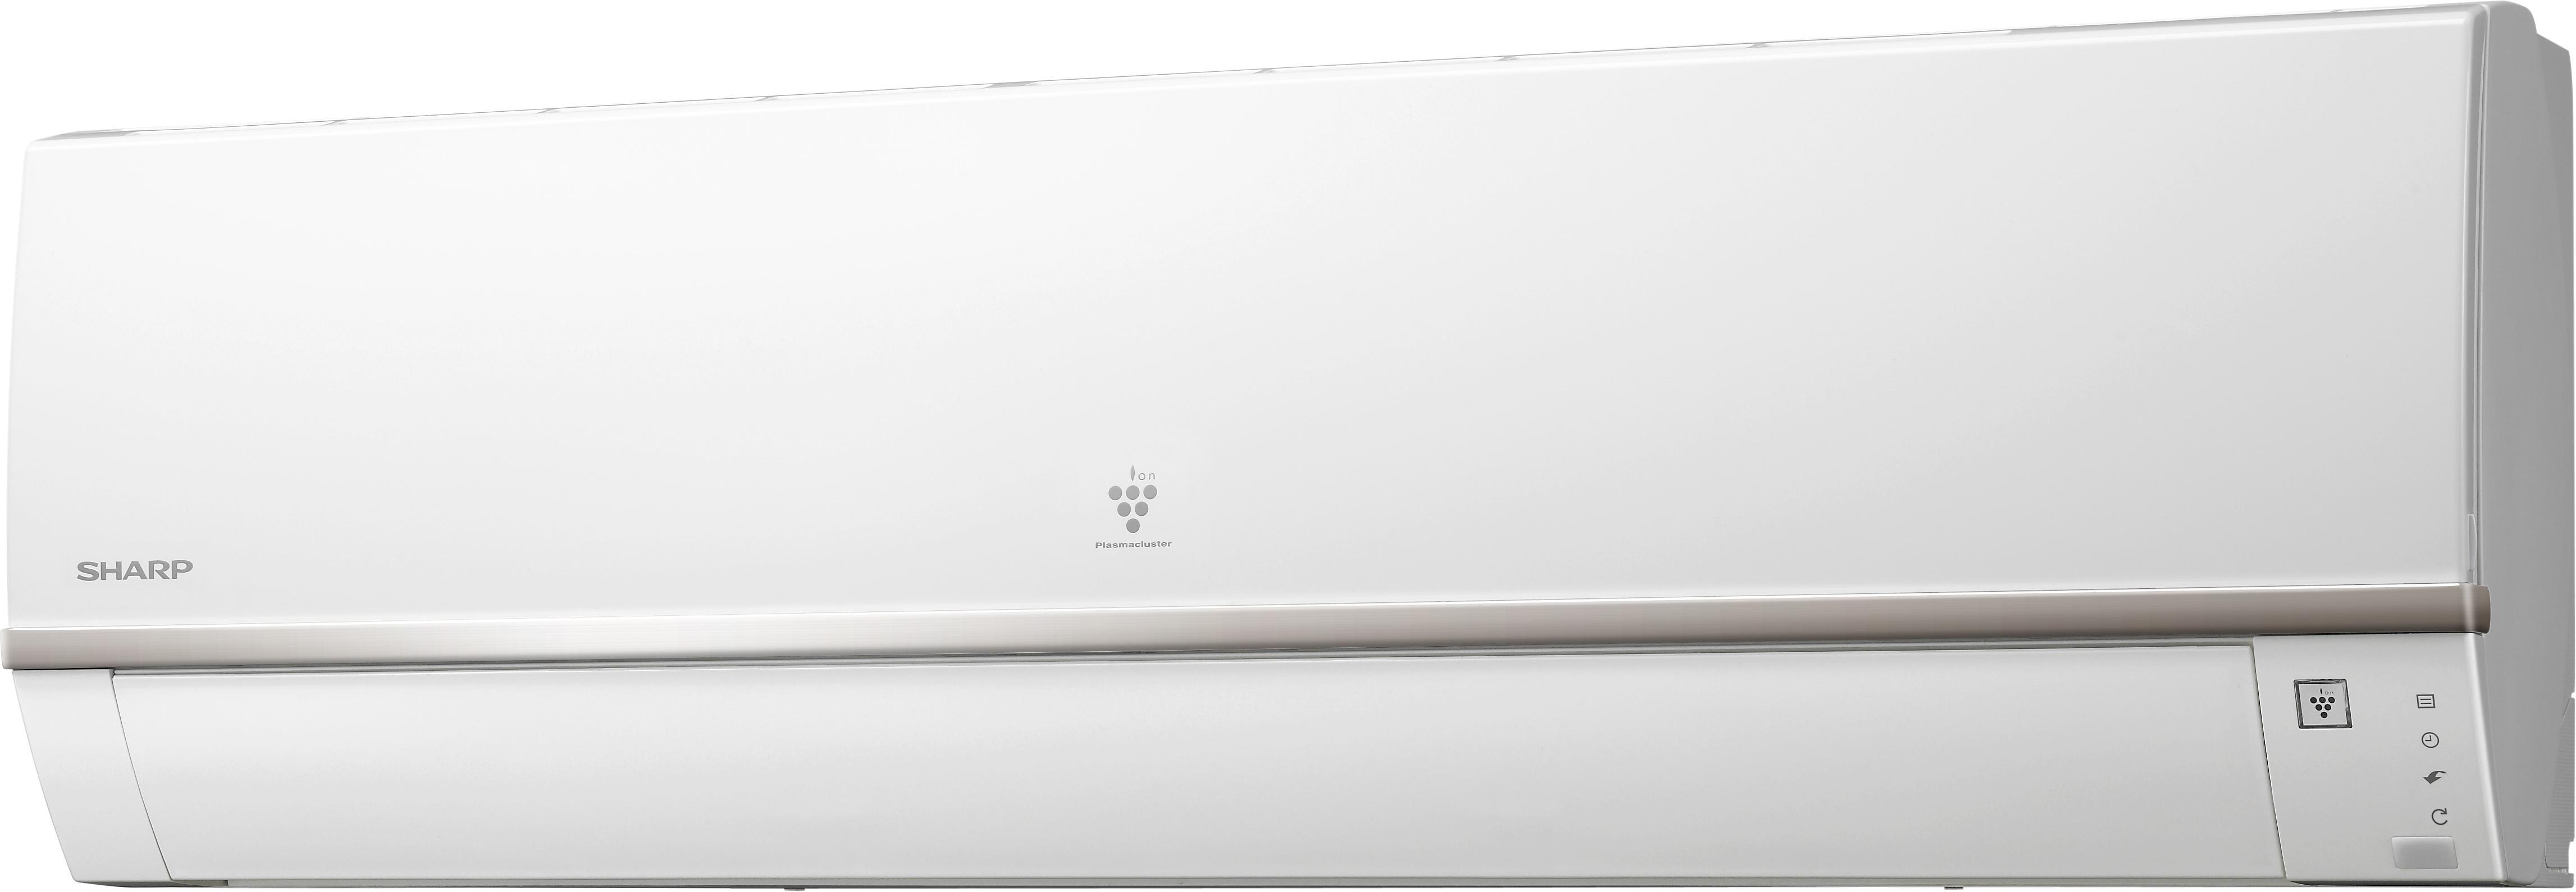 Sharp AY-XPC18LR / AE-X18LR